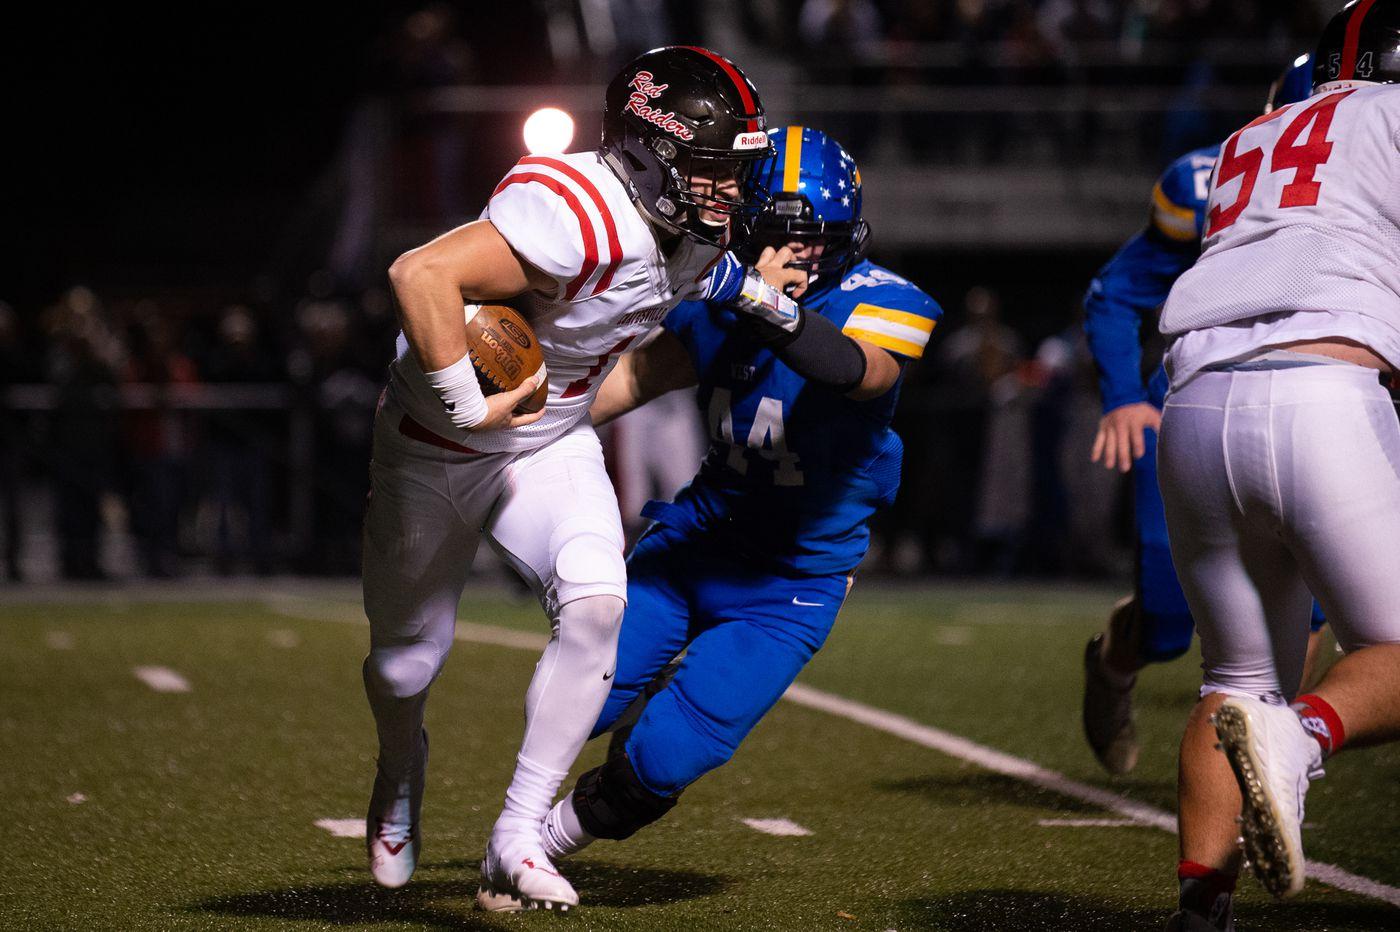 Southeastern Pennsylvania Football Rankings: No. 4 Coatesville sets state record